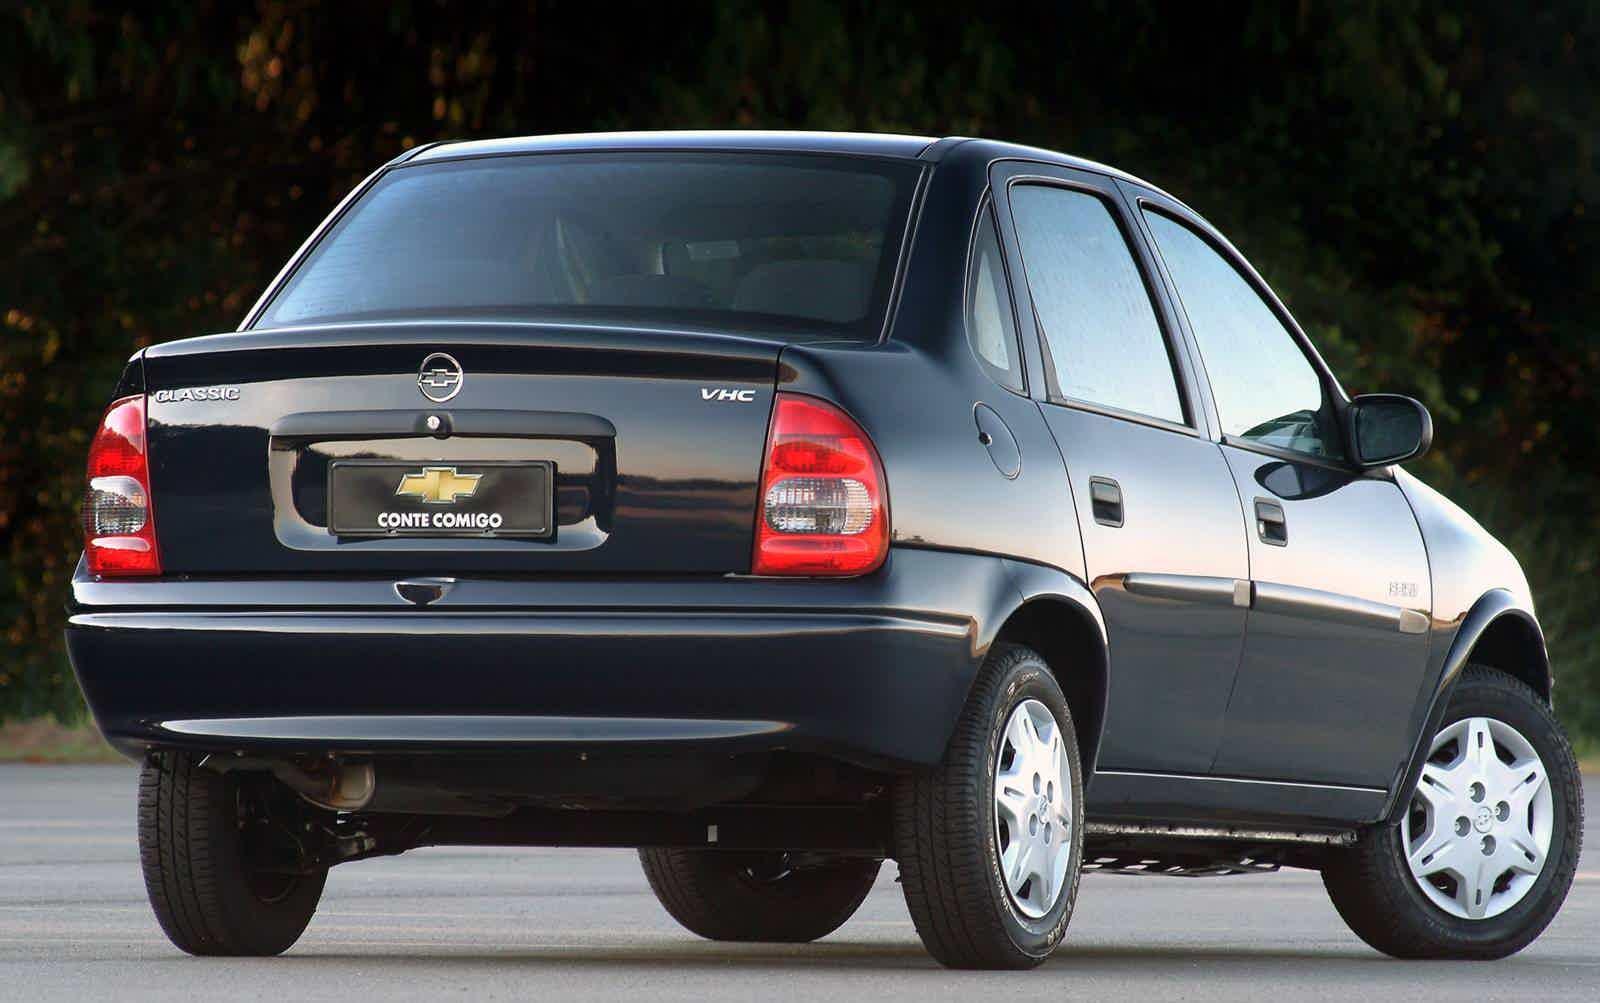 Corsa Sedan Classic 1.6 automático 2005